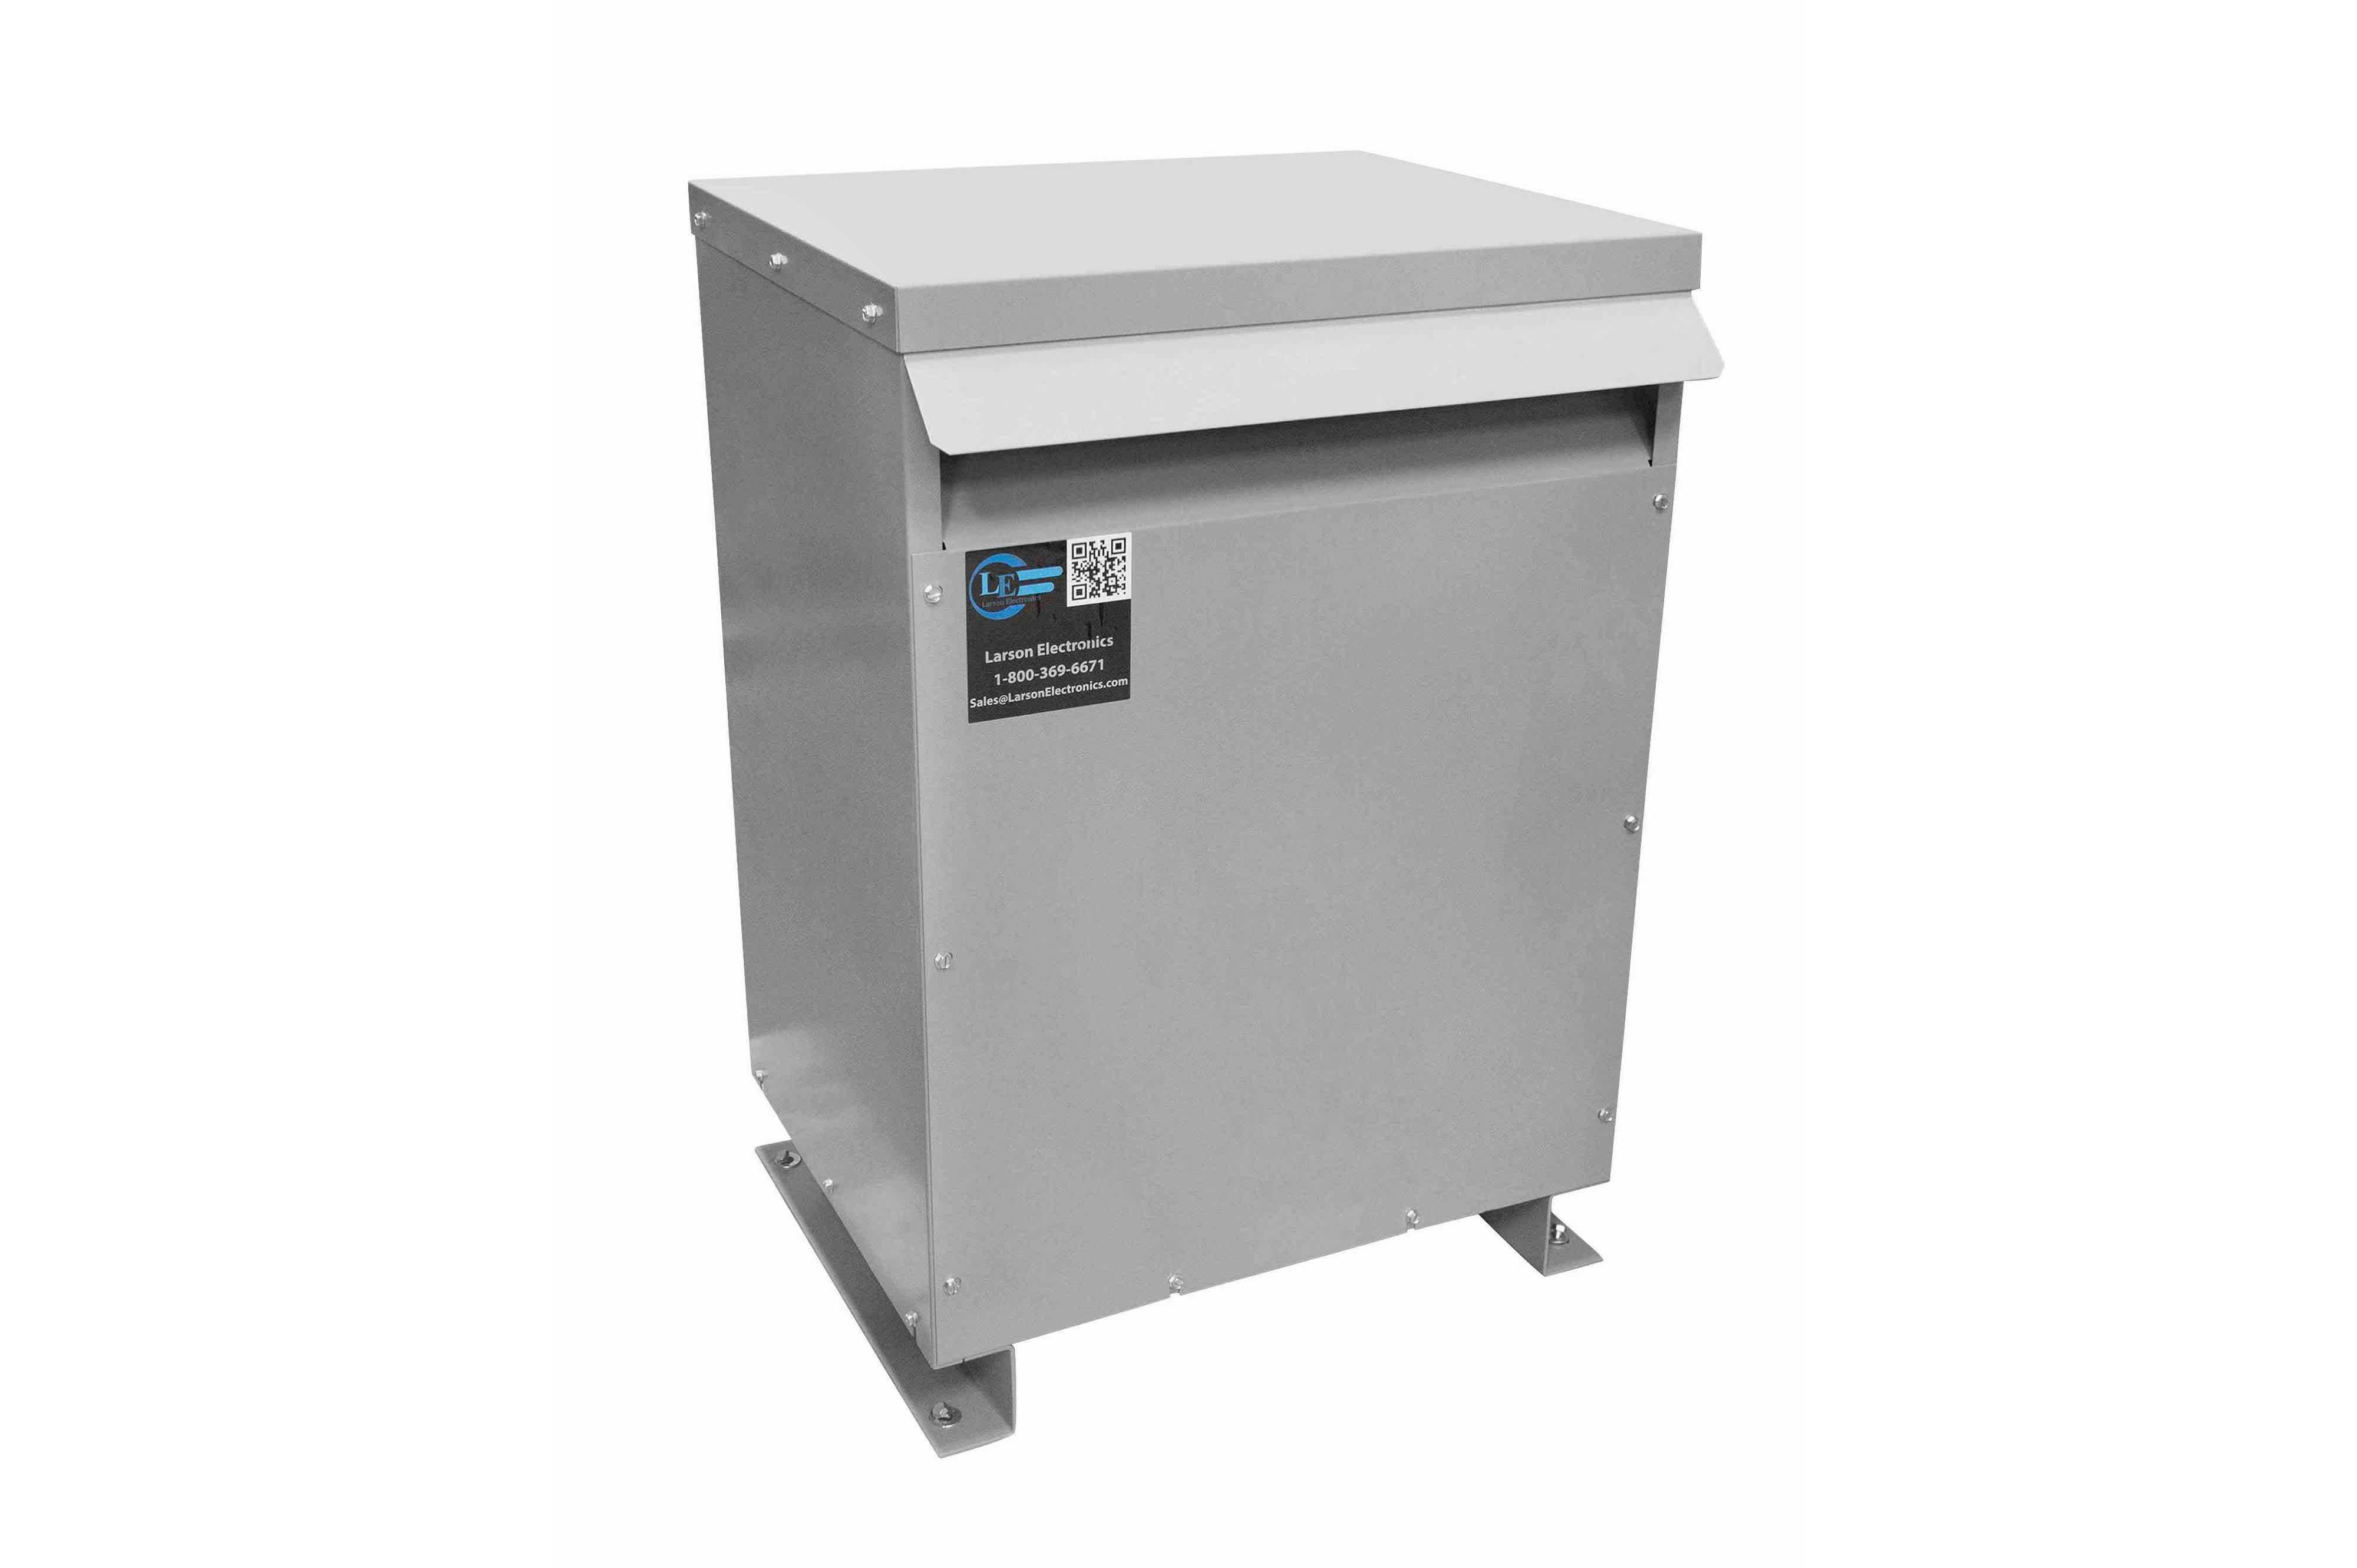 20 kVA 3PH Isolation Transformer, 415V Wye Primary, 600V Delta Secondary, N3R, Ventilated, 60 Hz